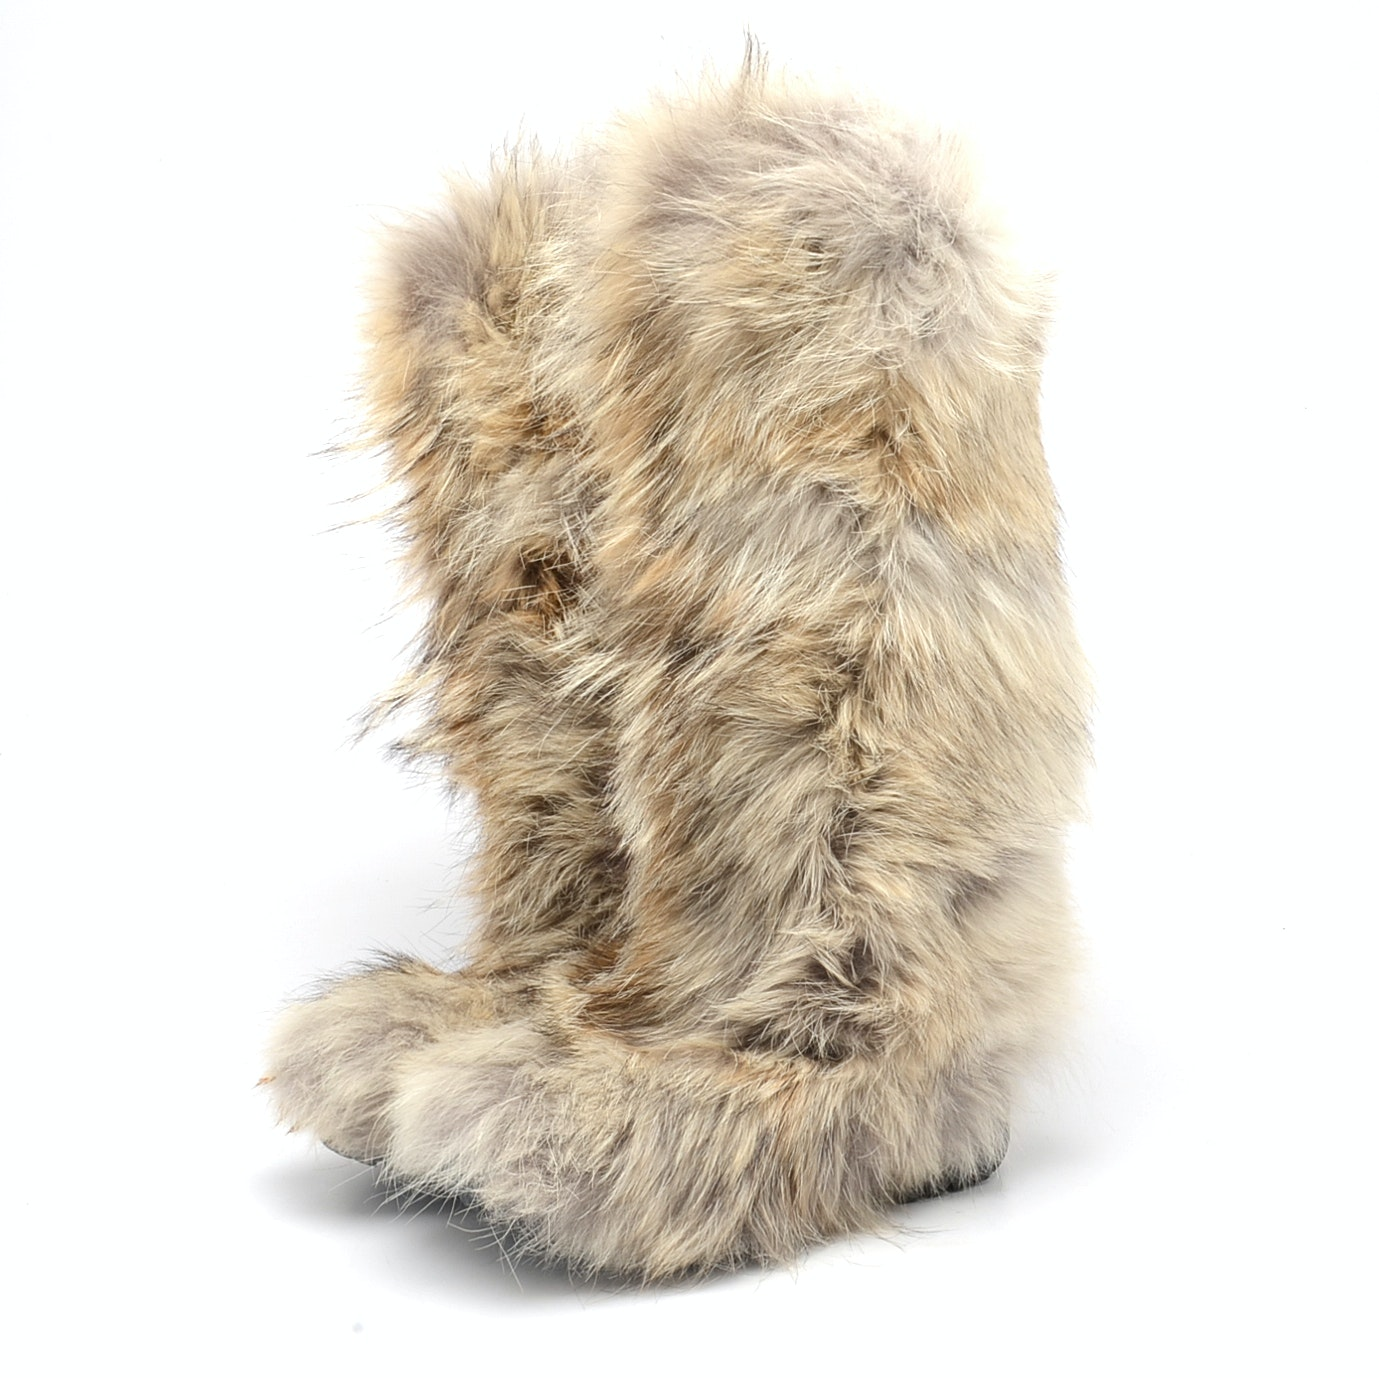 Ralph Lauren Collection Coyote Fur Boots